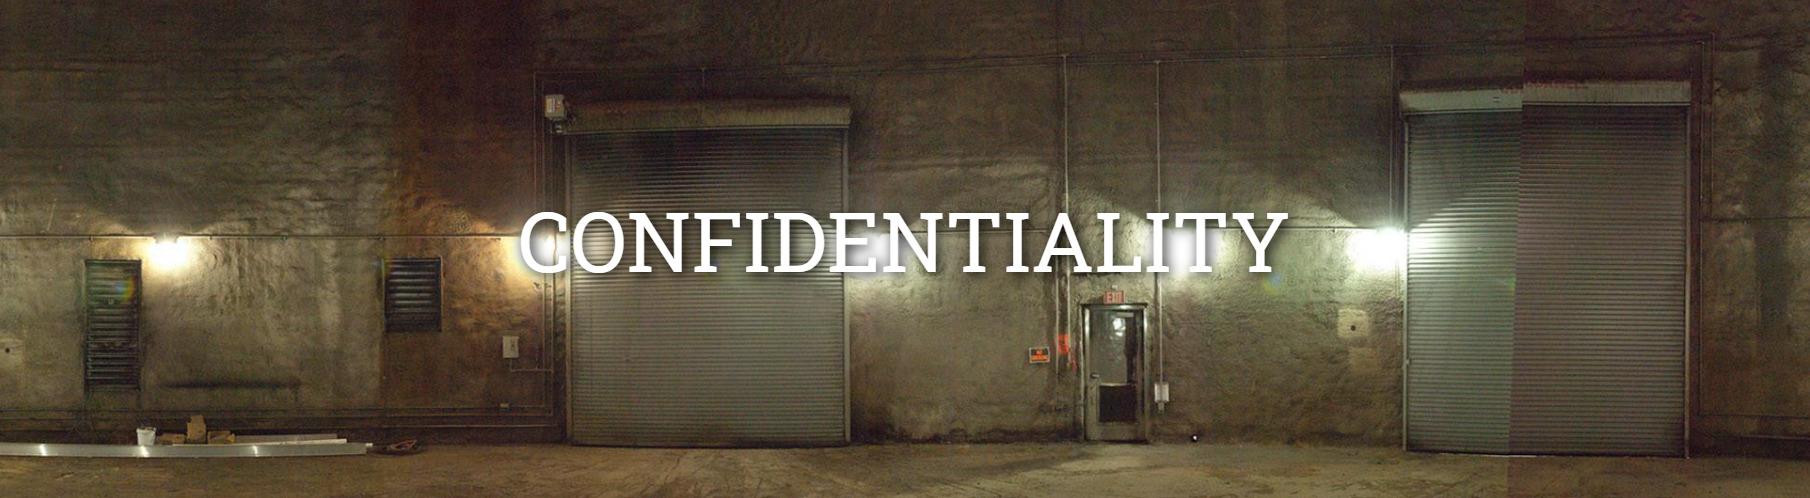 slider-confidentiality